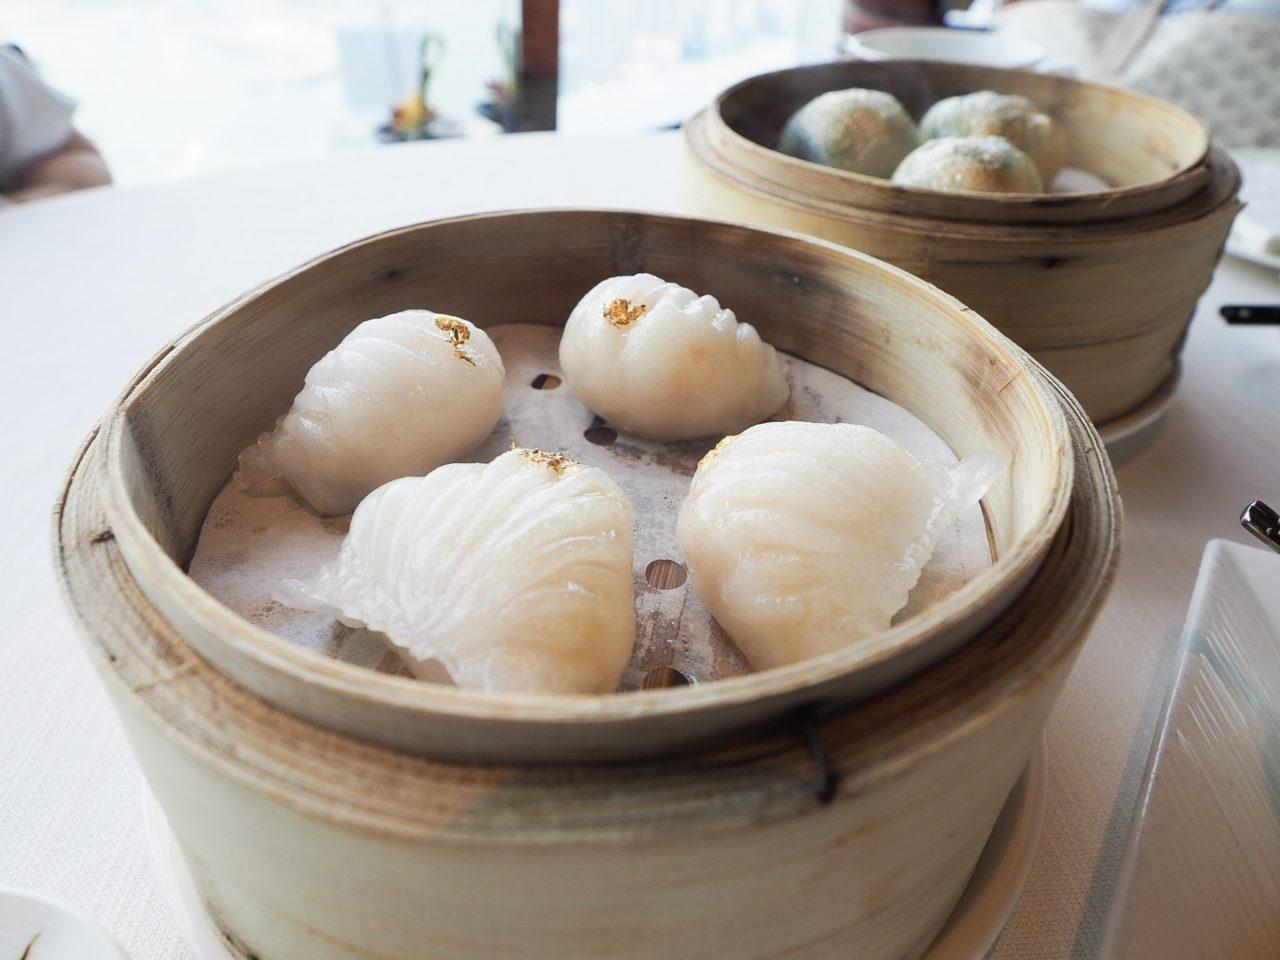 img 0577 - TIN LUNG HEEN- ザ・リッツ・カールトン香港 102階でいただく天龍軒の絶品飲茶